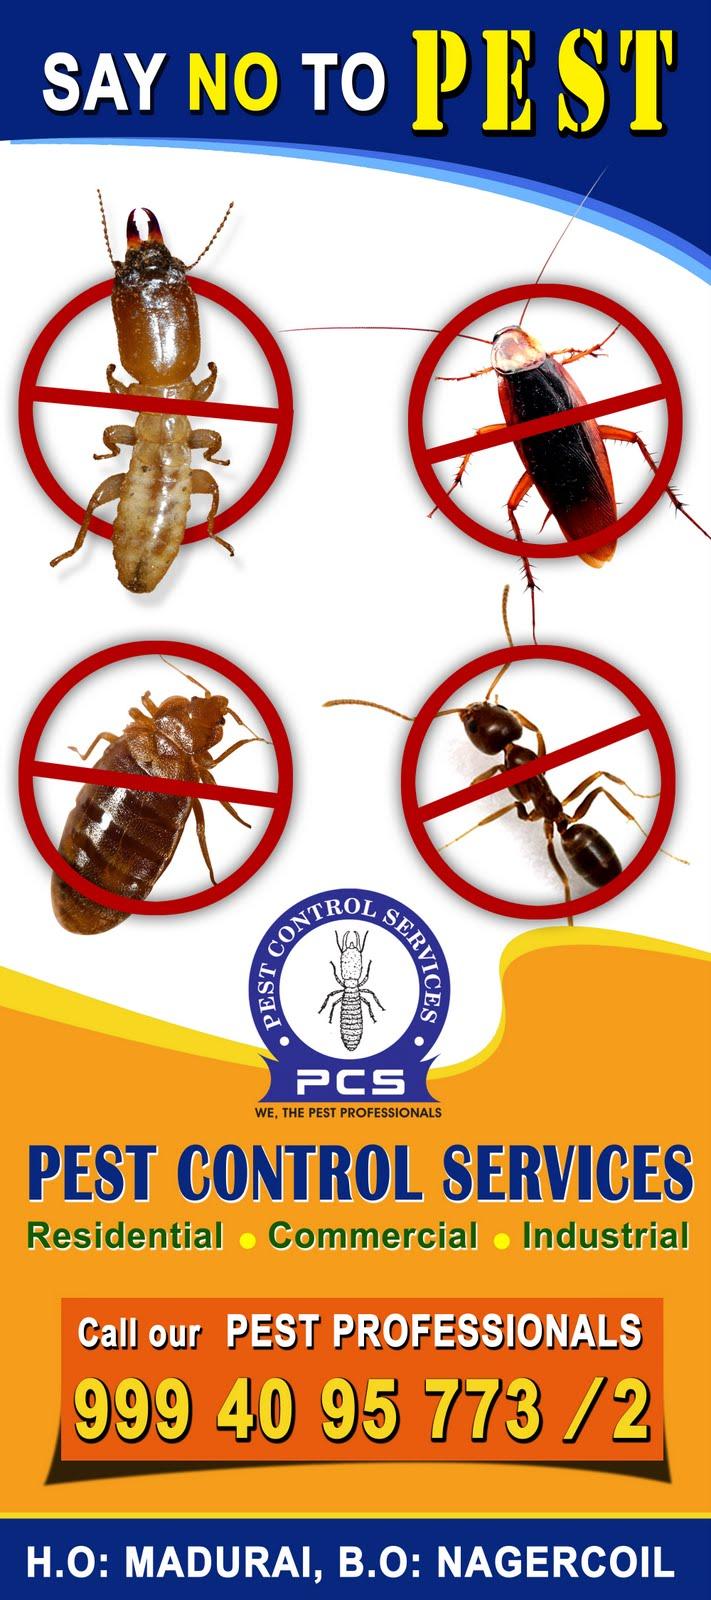 Pest Control Services : Pest control services